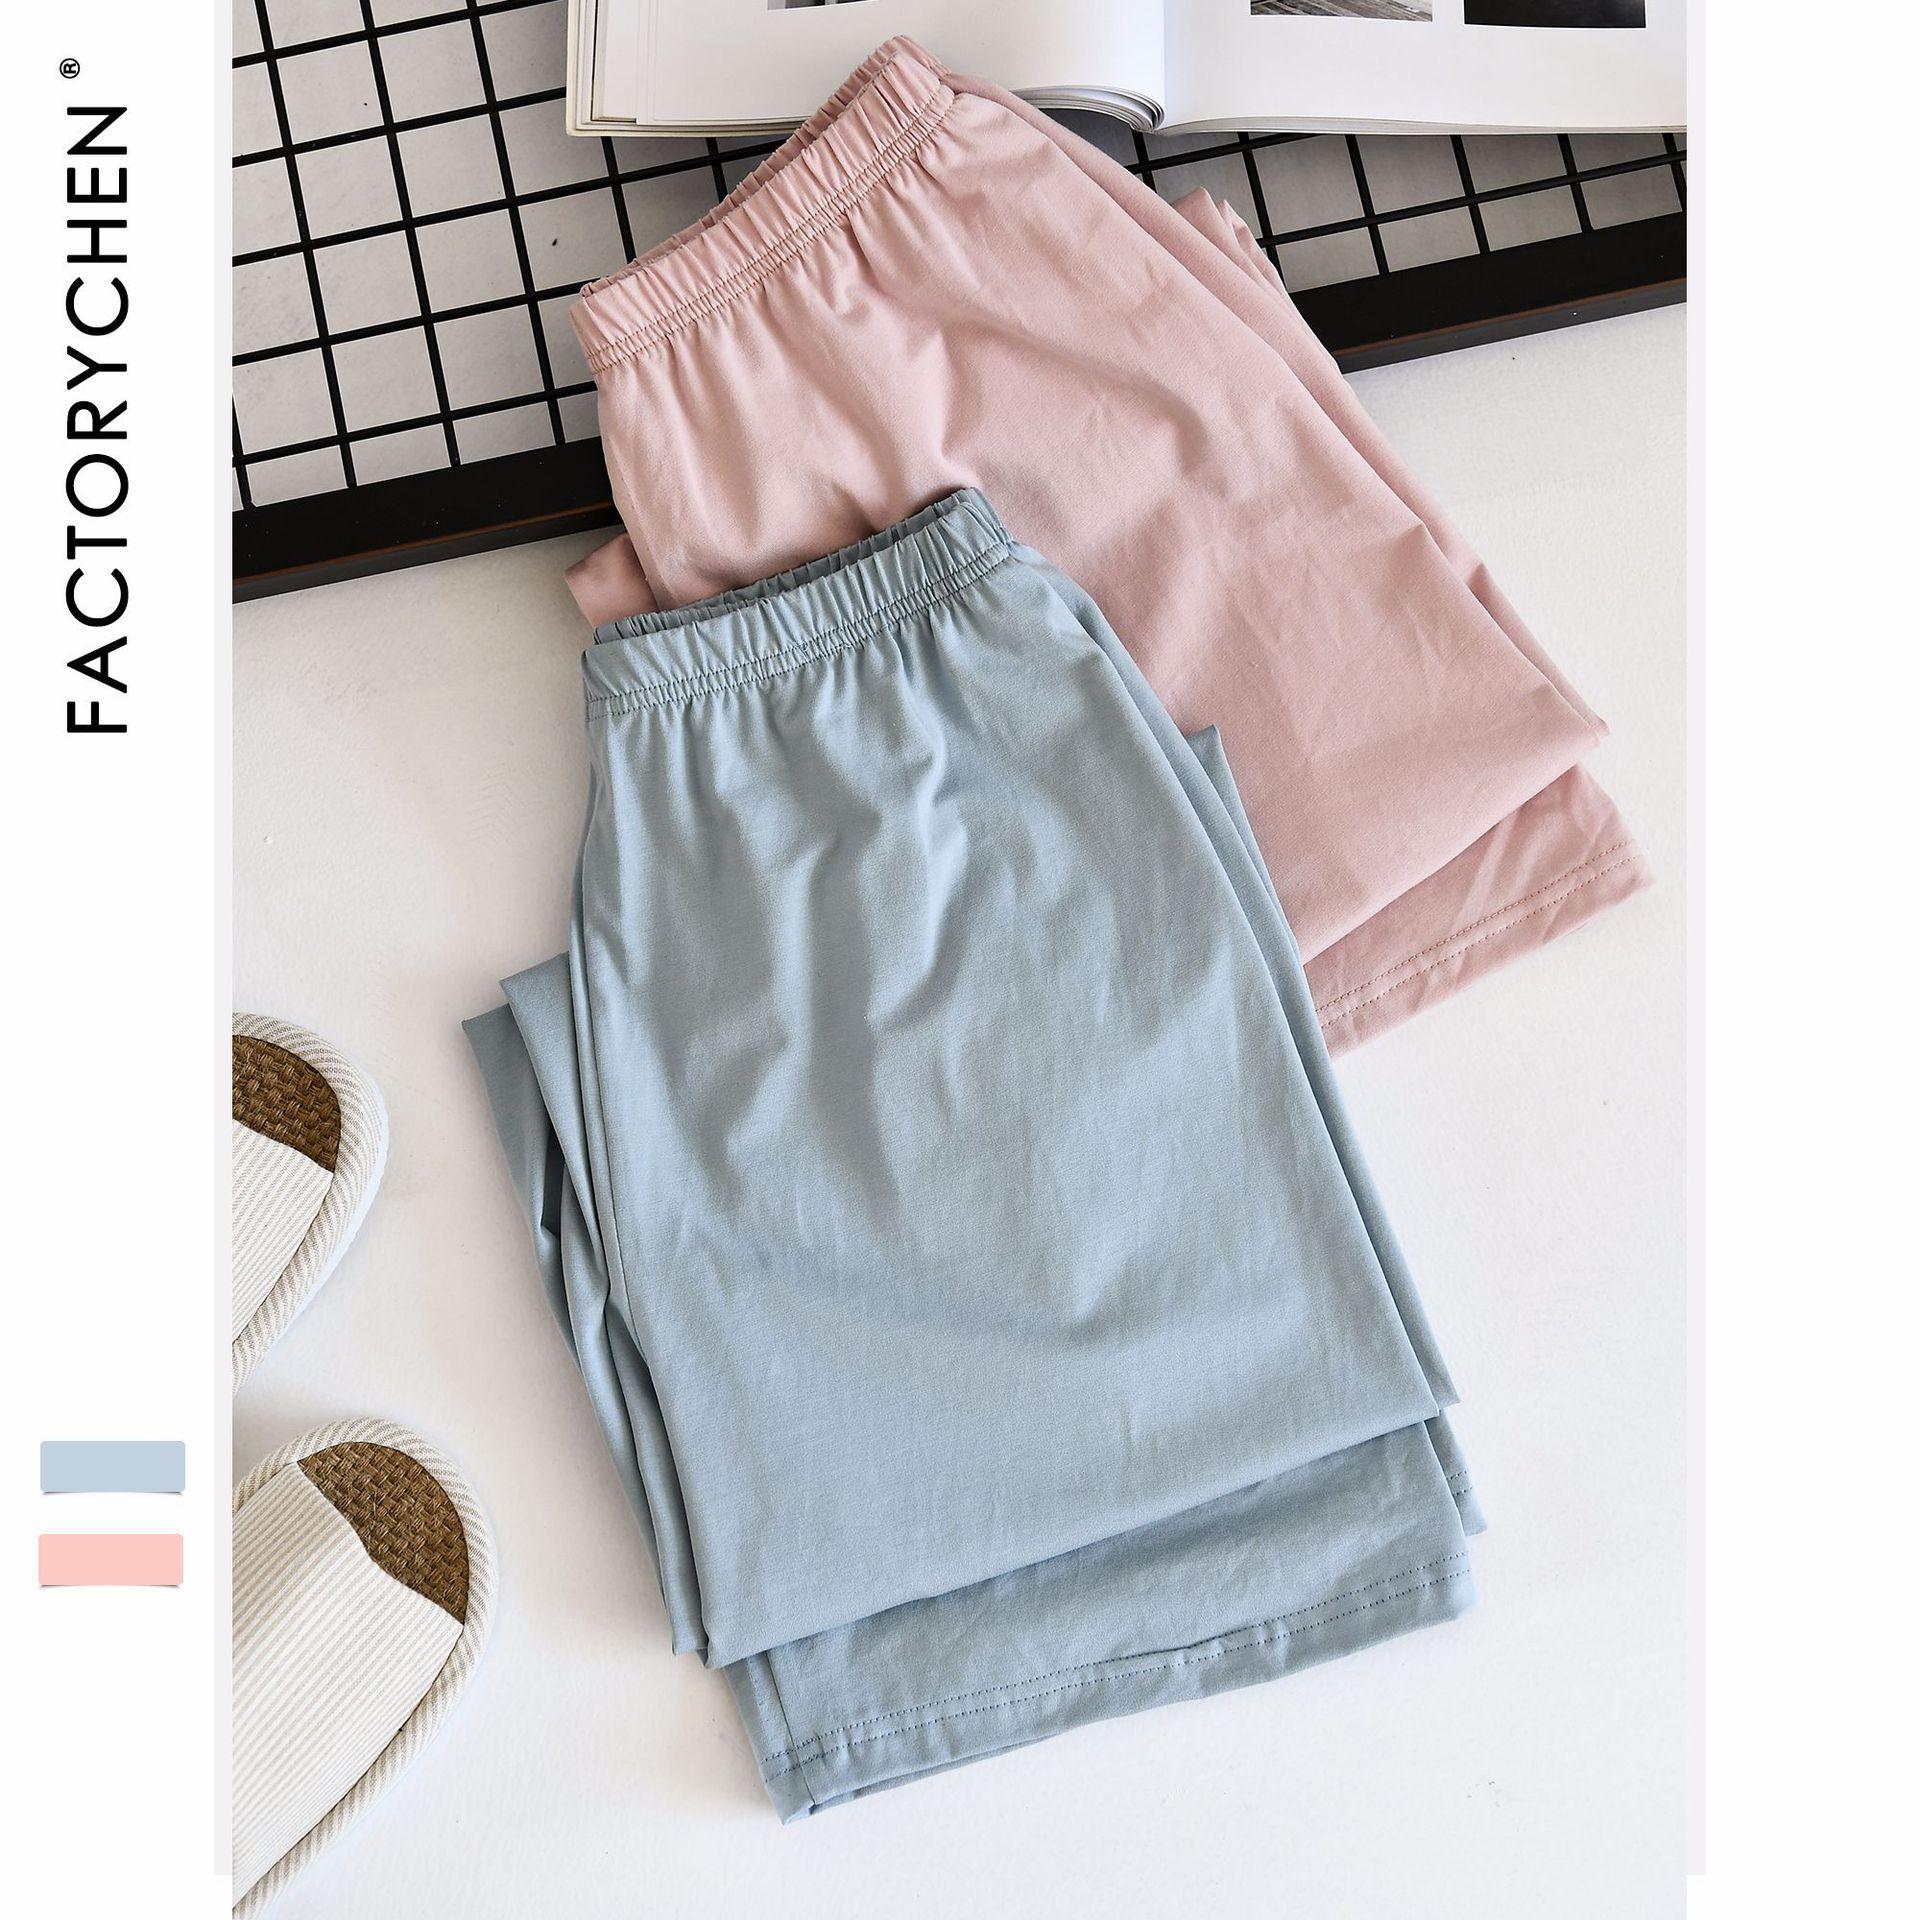 Summer Female Loose Plus Size Sleep Bottoms Comfortable Good Material Elastic Ammonia + Cotton Thin Household Sleepwear Pants 1